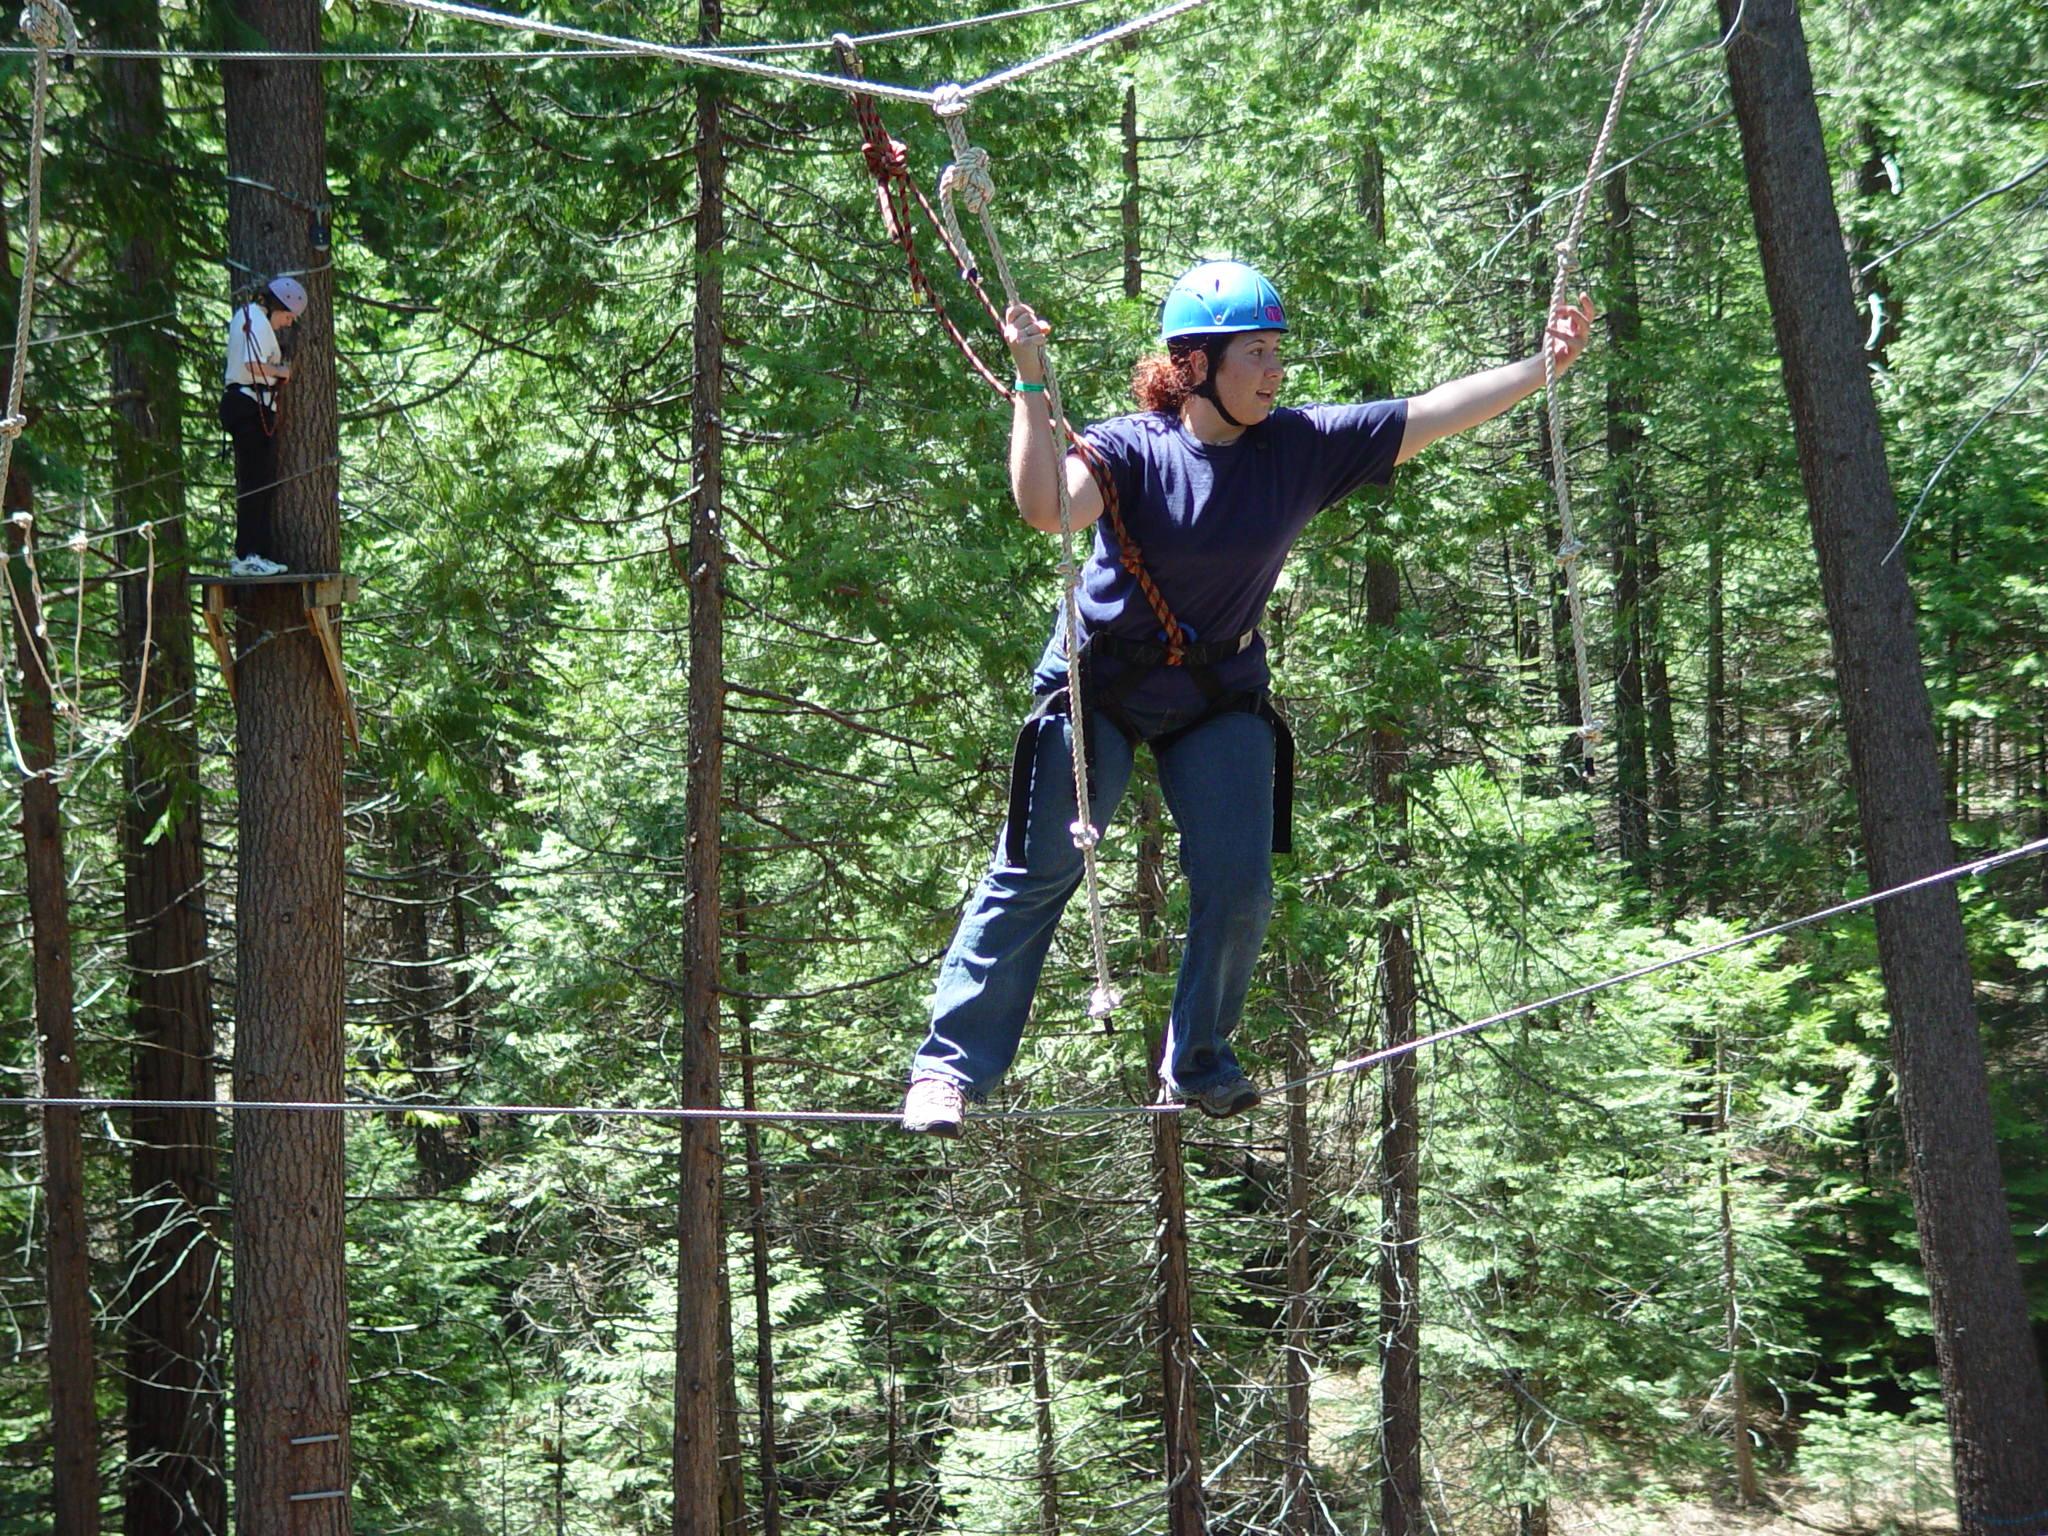 Sky Park high ropes course